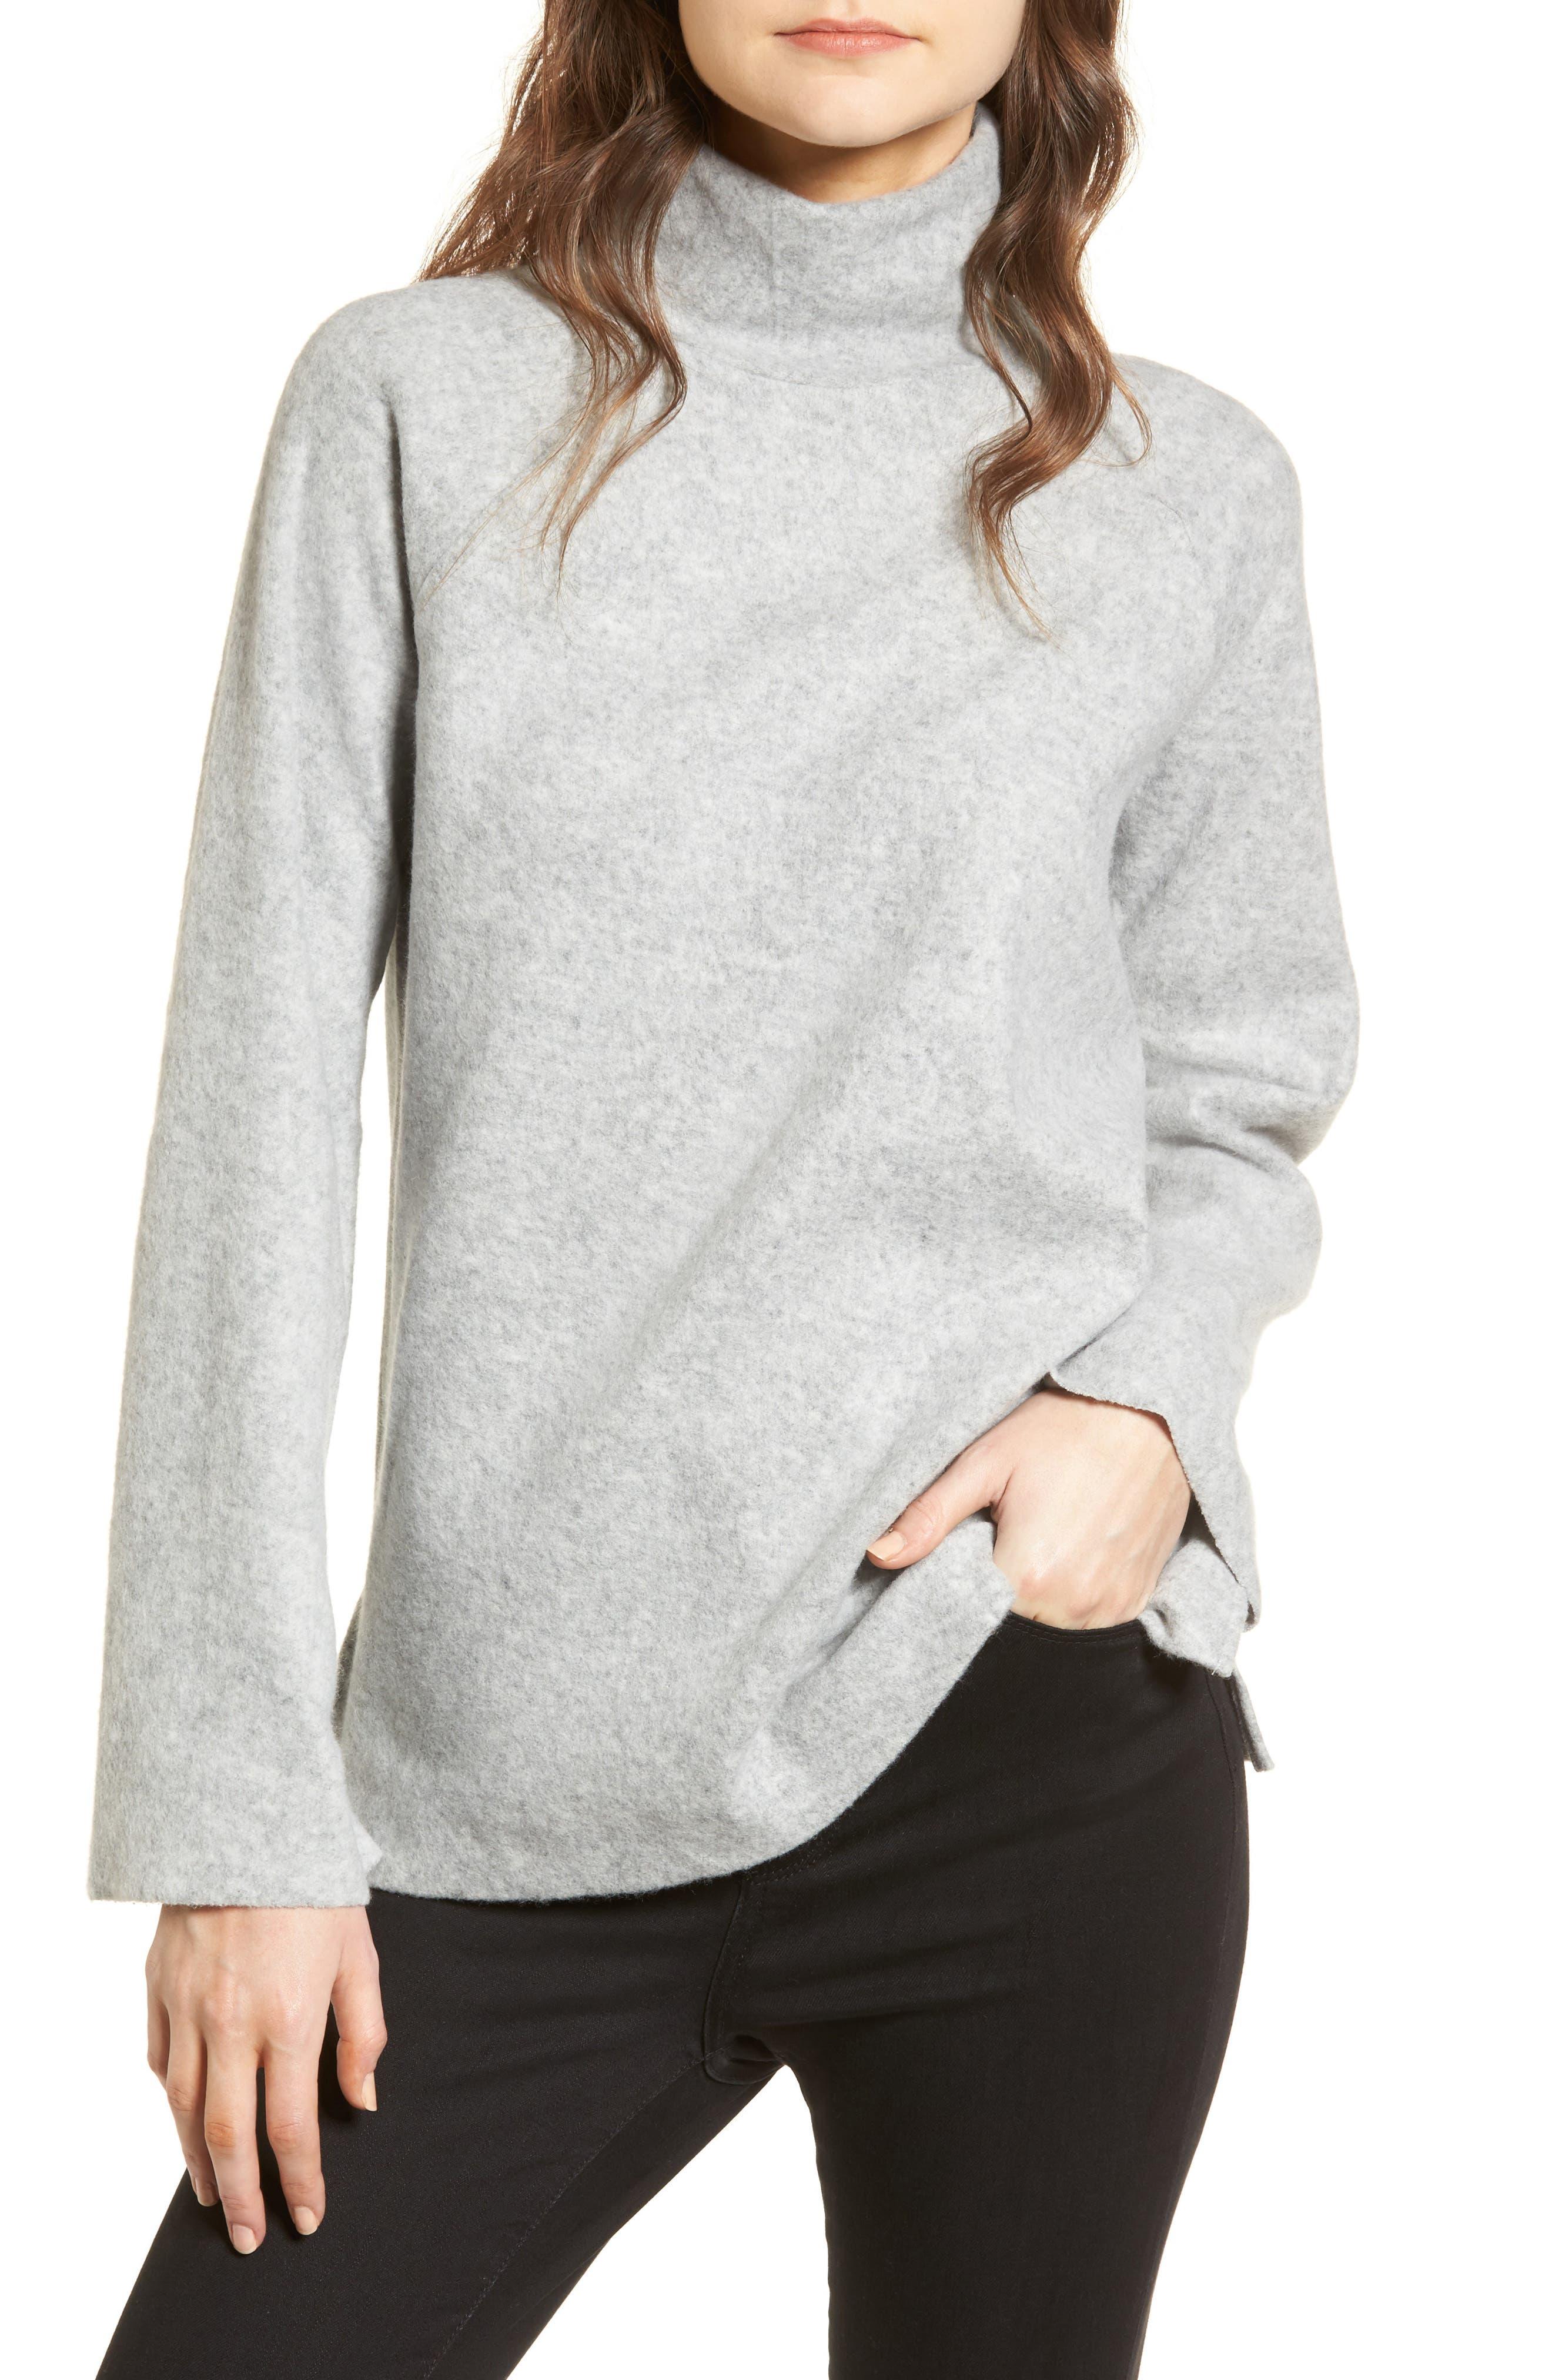 Bell Sleeve Sweatshirt,                             Main thumbnail 1, color,                             Grey Heather